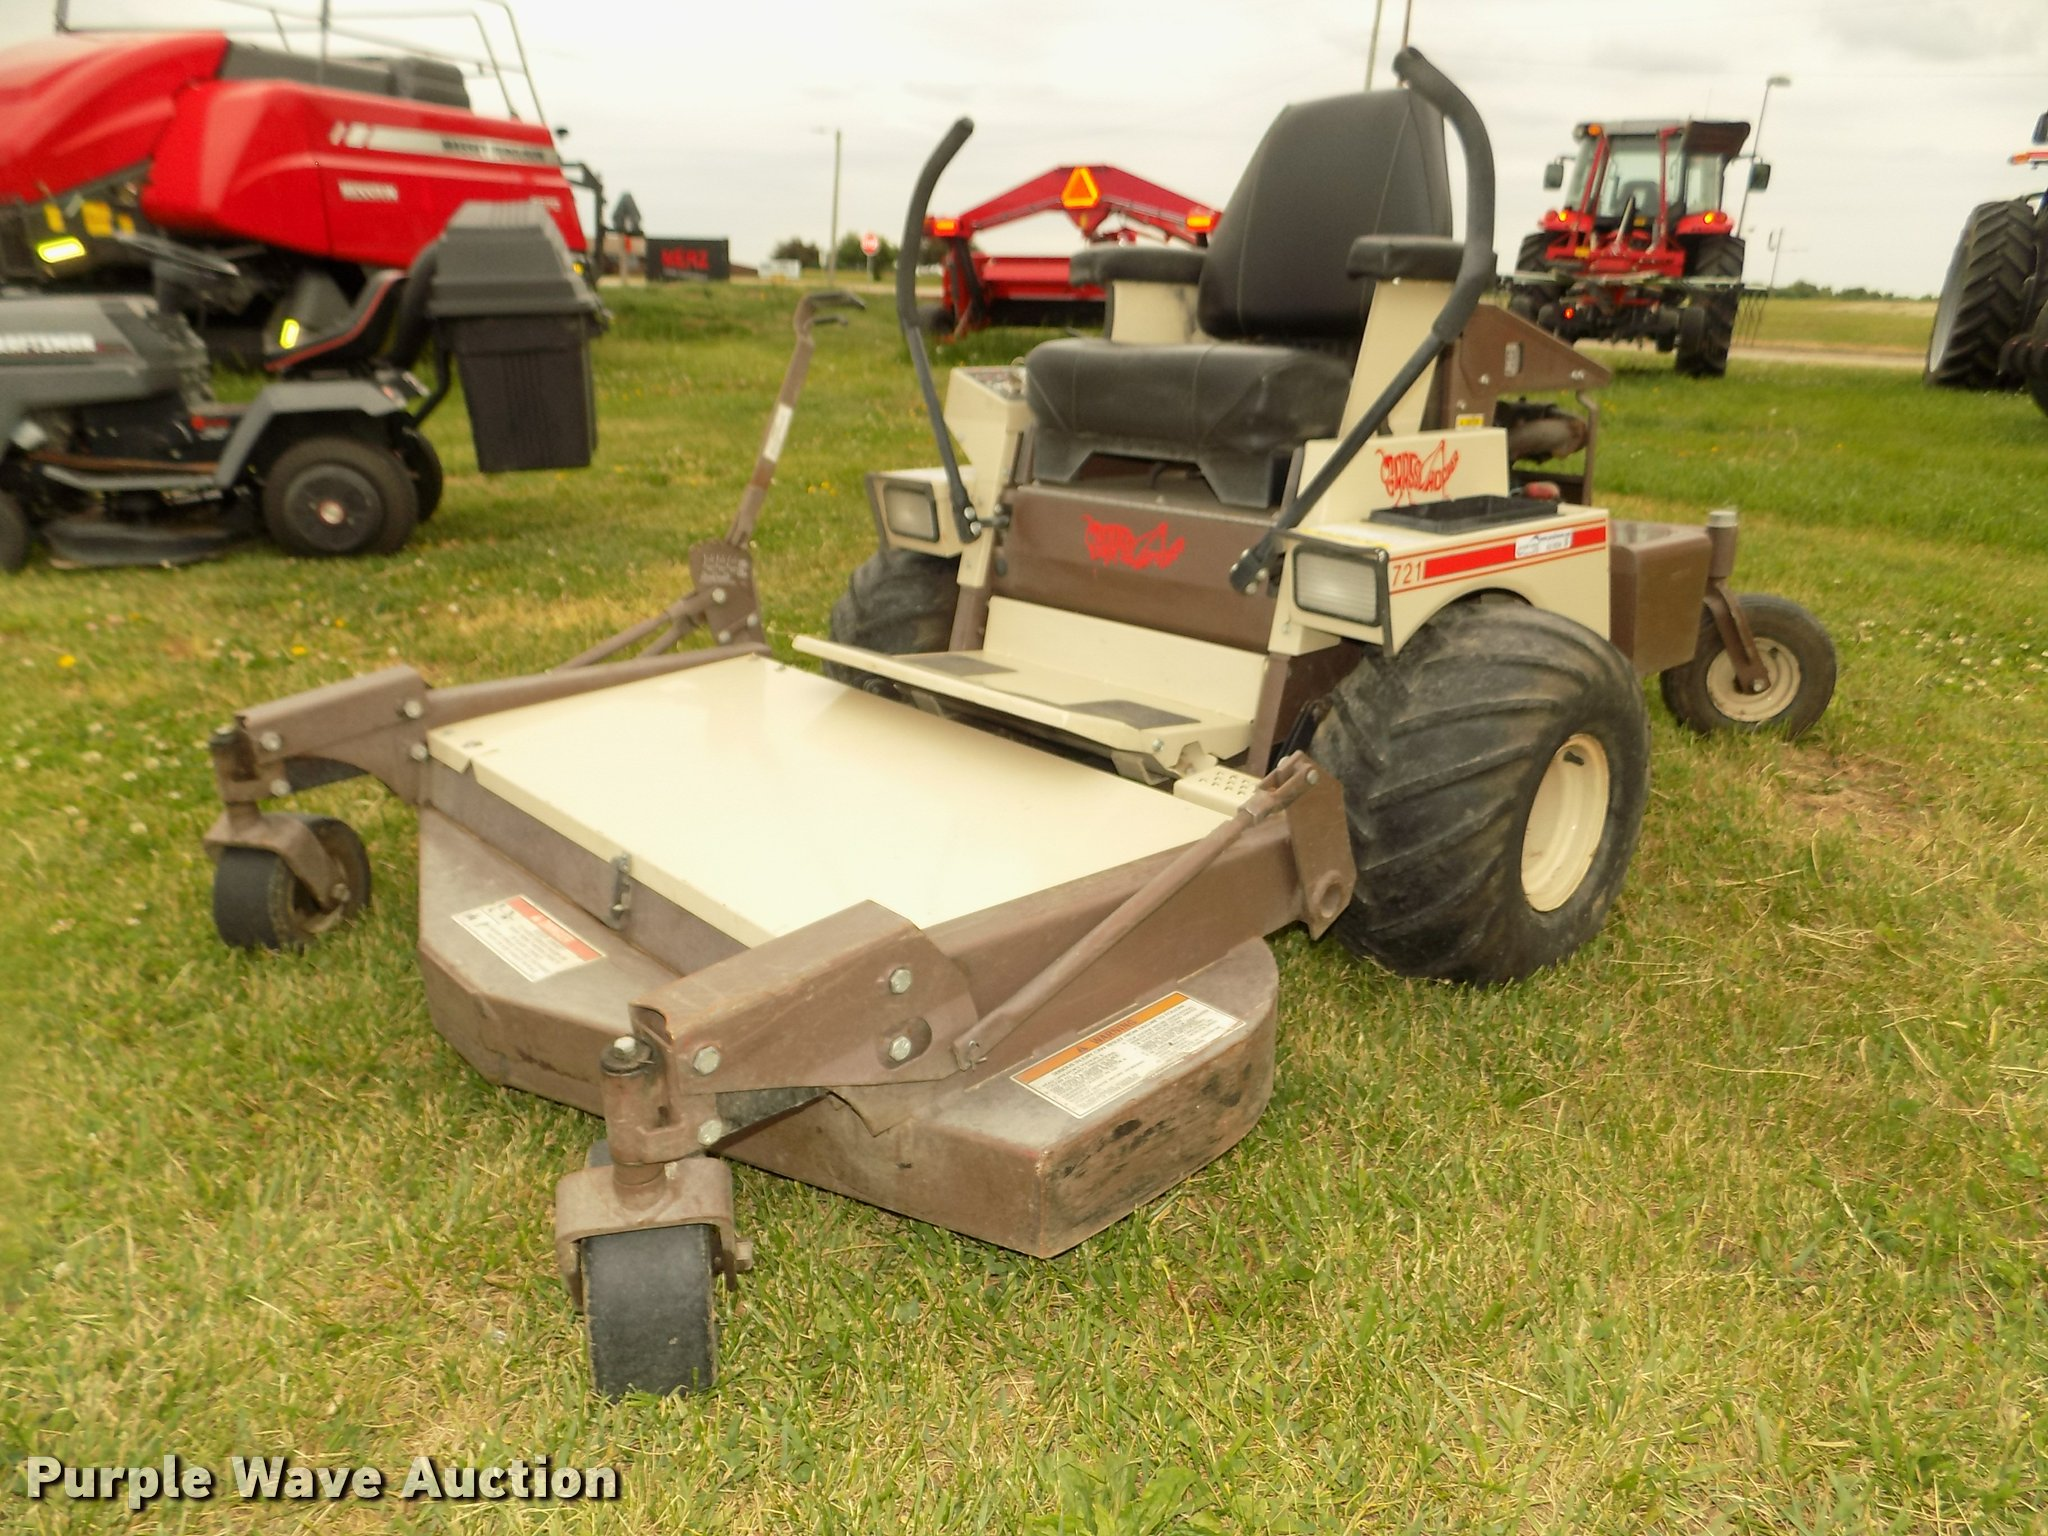 Grasshopper 721 ZTR lawn mower | Item AU9534 | SOLD! June 7 ...